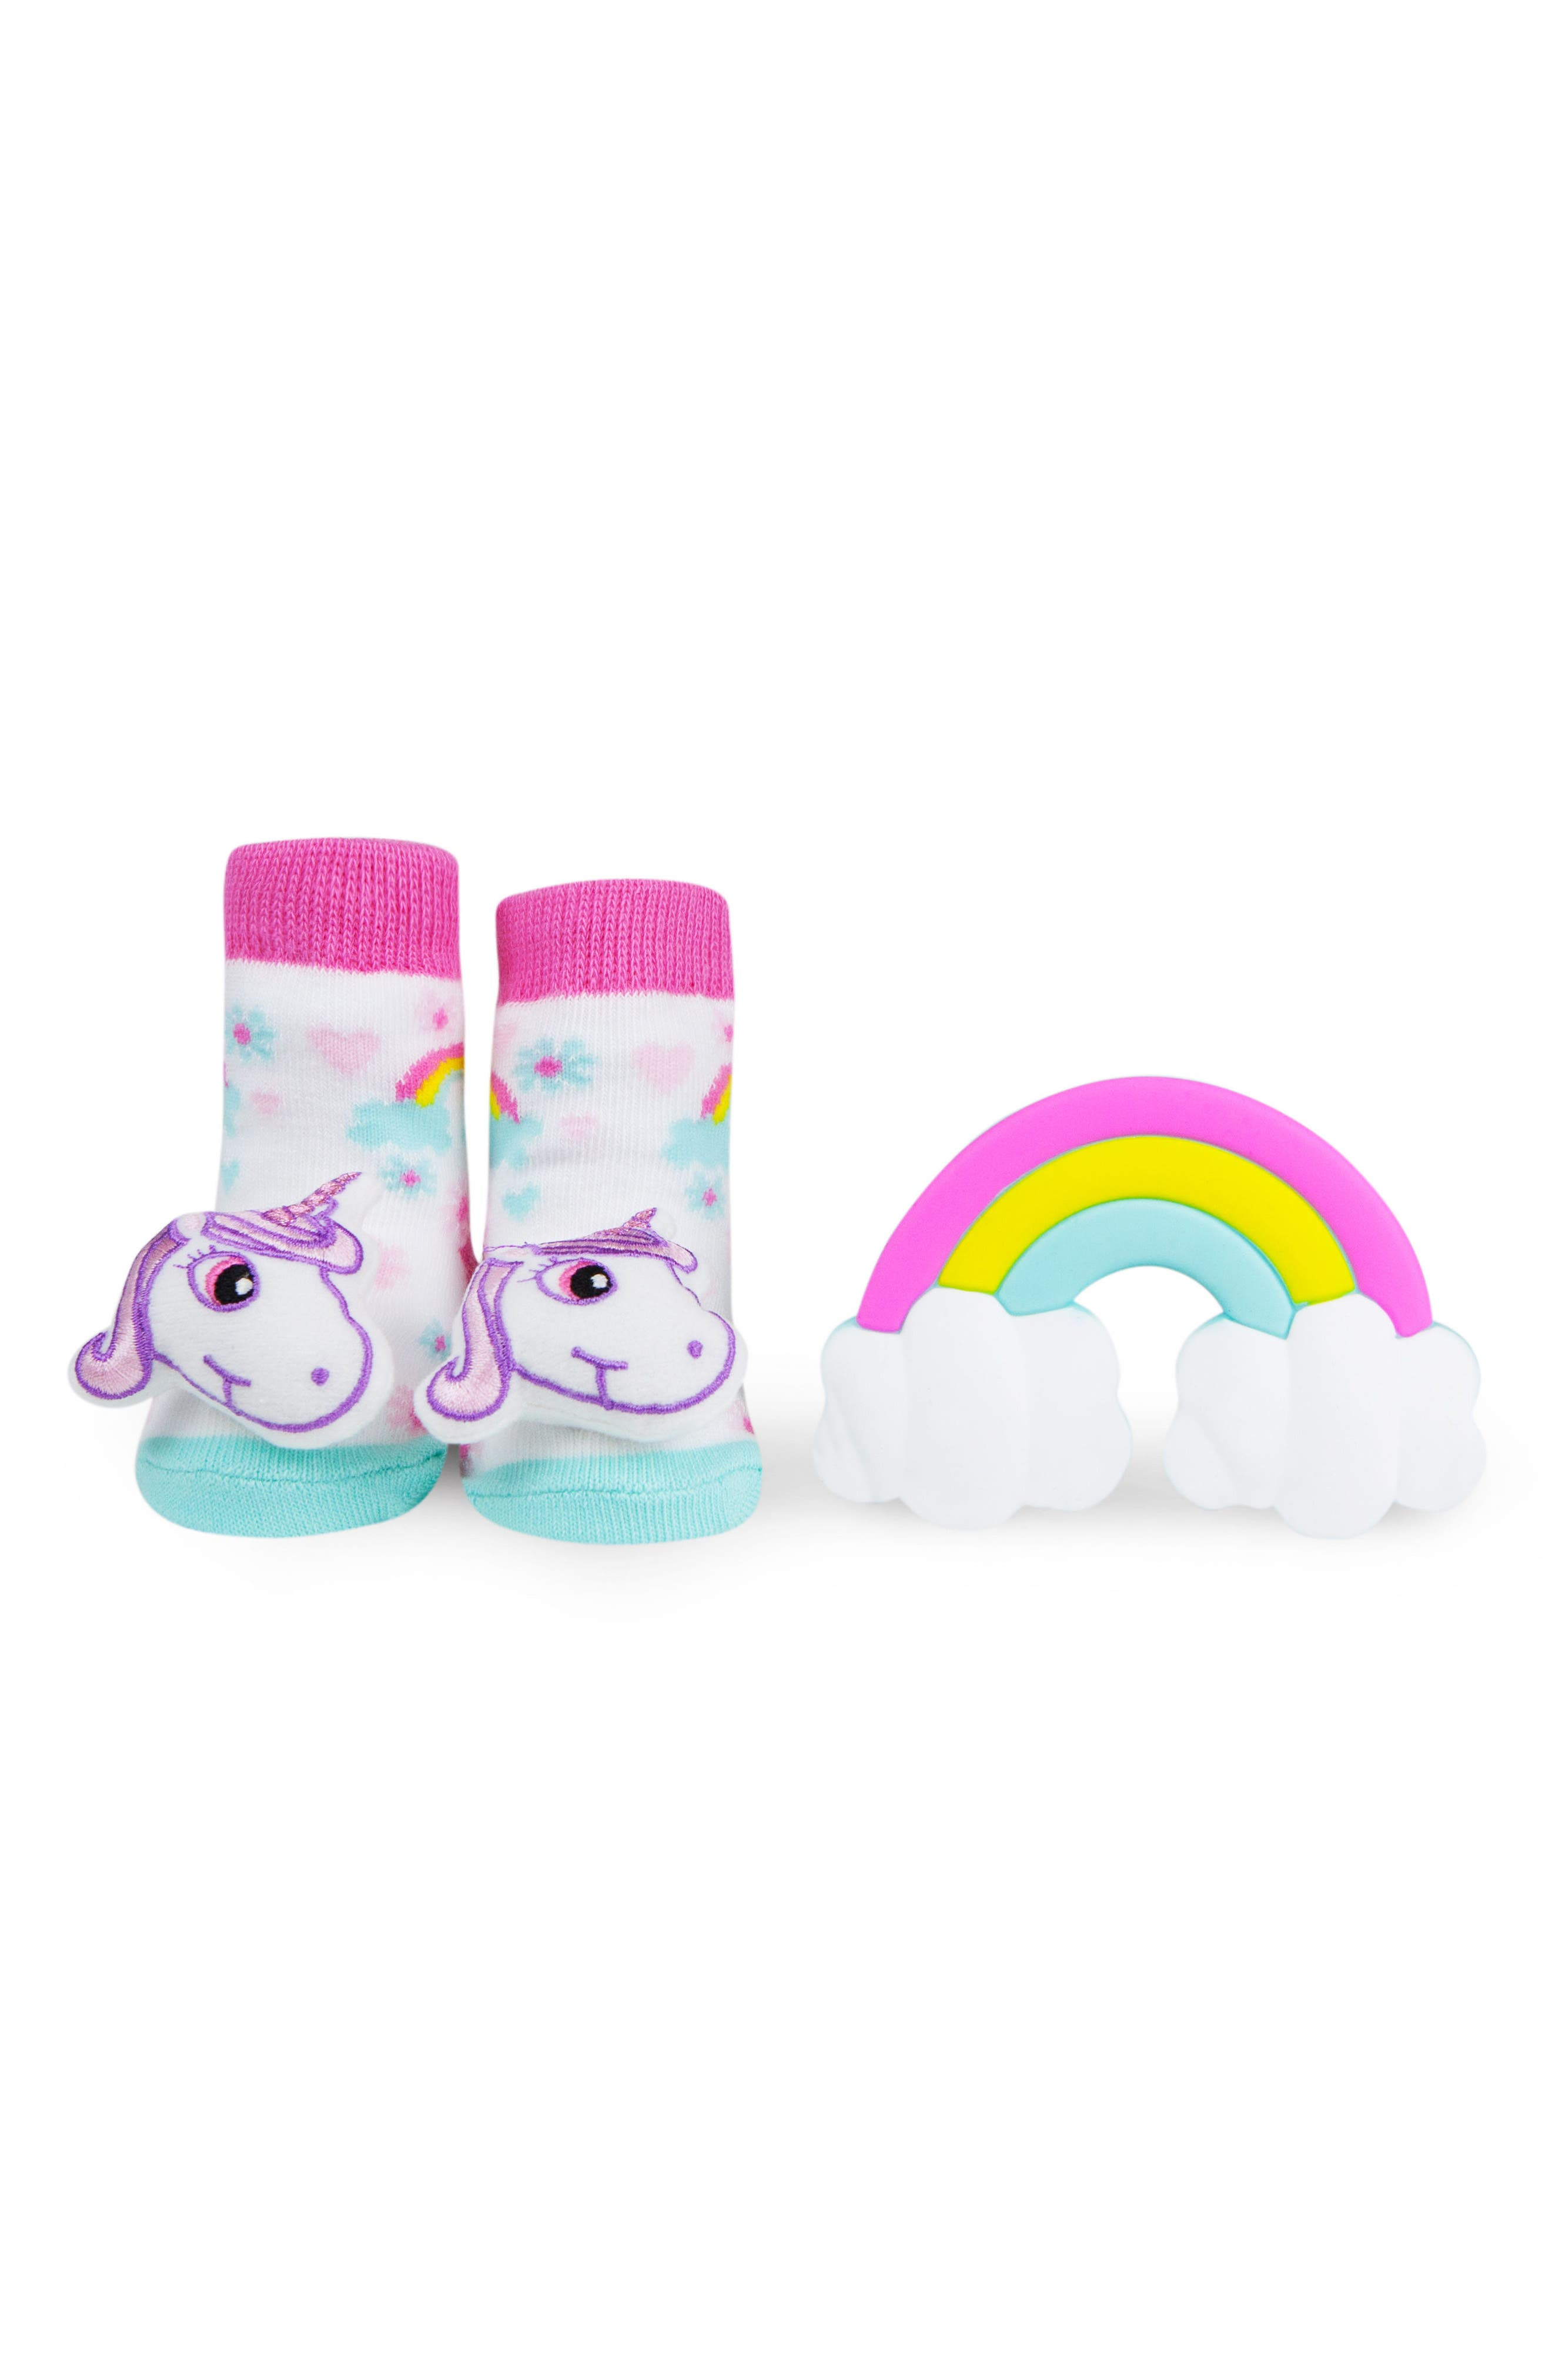 & Friends Unicorn Rattle Socks & Teether Gift Set,                             Main thumbnail 1, color,                             White